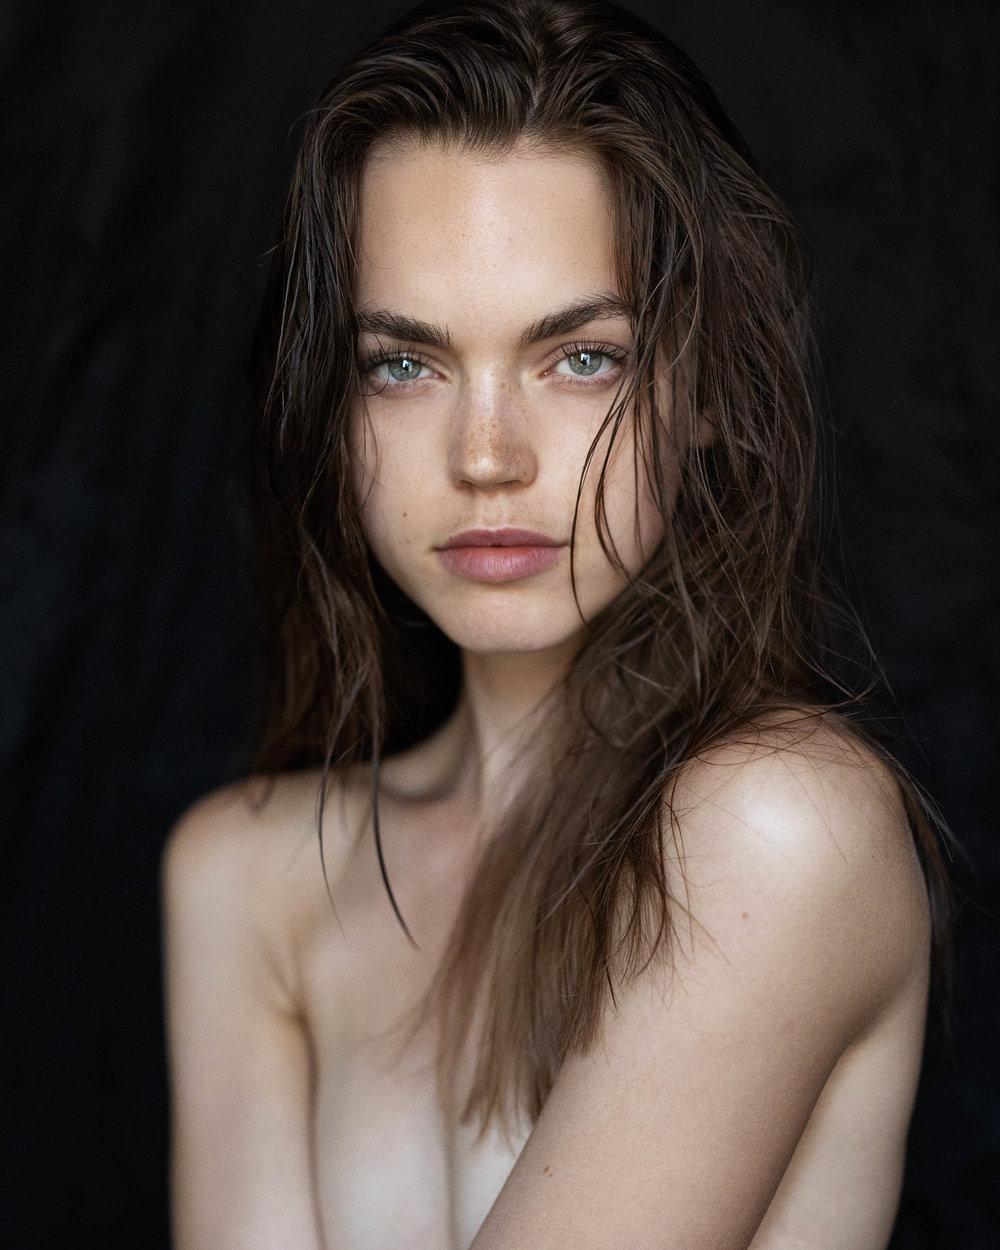 Photograph of Eva by headshot photographer Nick Walters.jpg